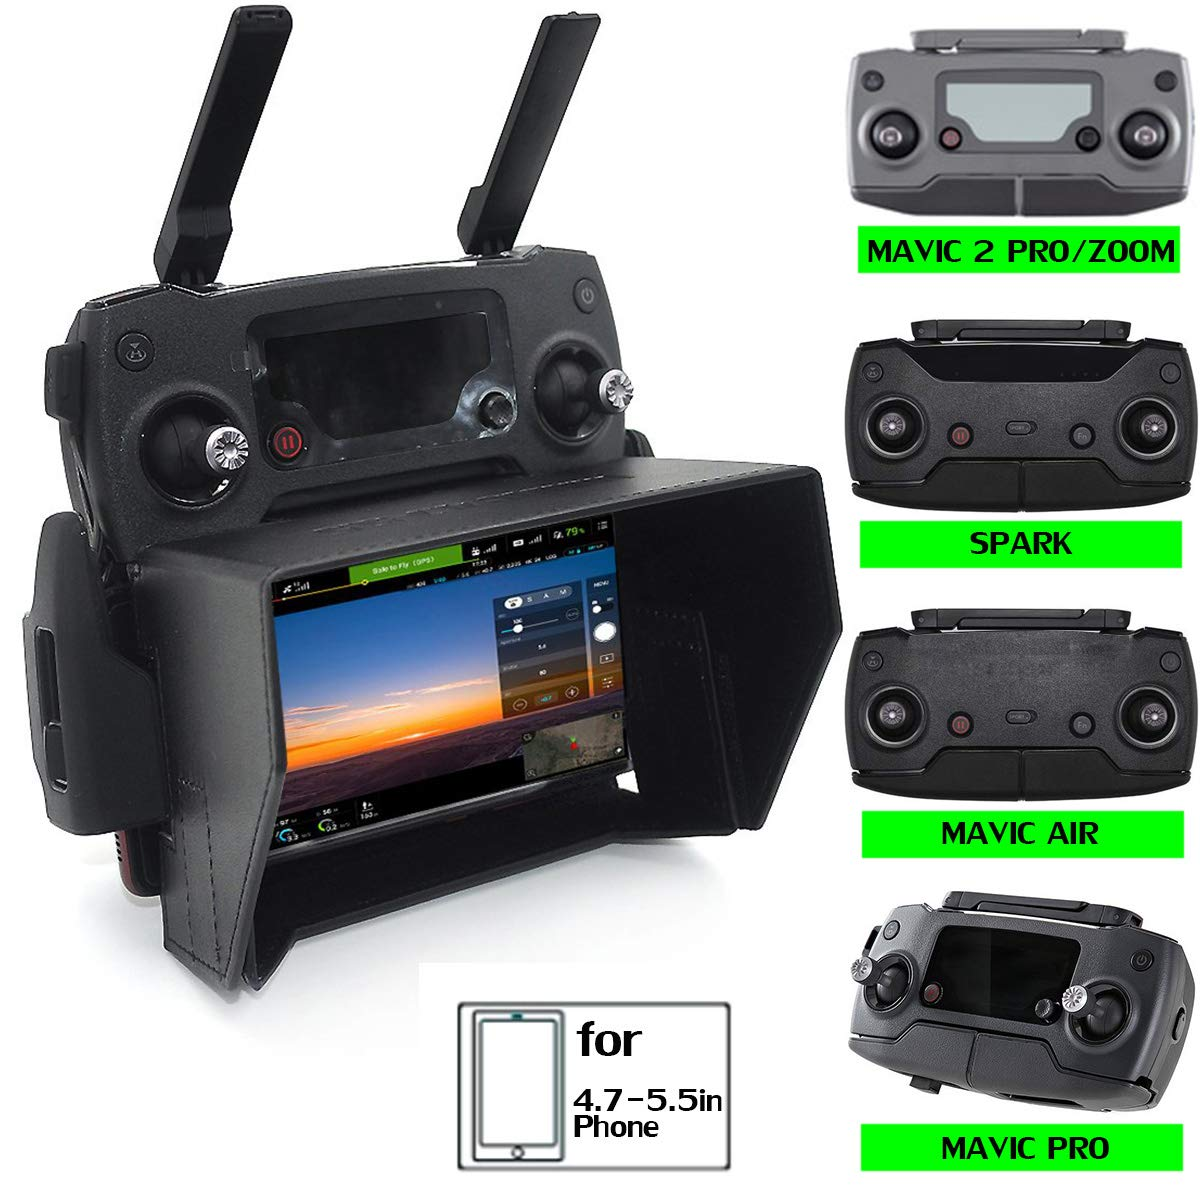 Sun Hood Sunshade for DJI Mavic PRO / mavic air / SPARK Accessories RC  Drone Remote Control